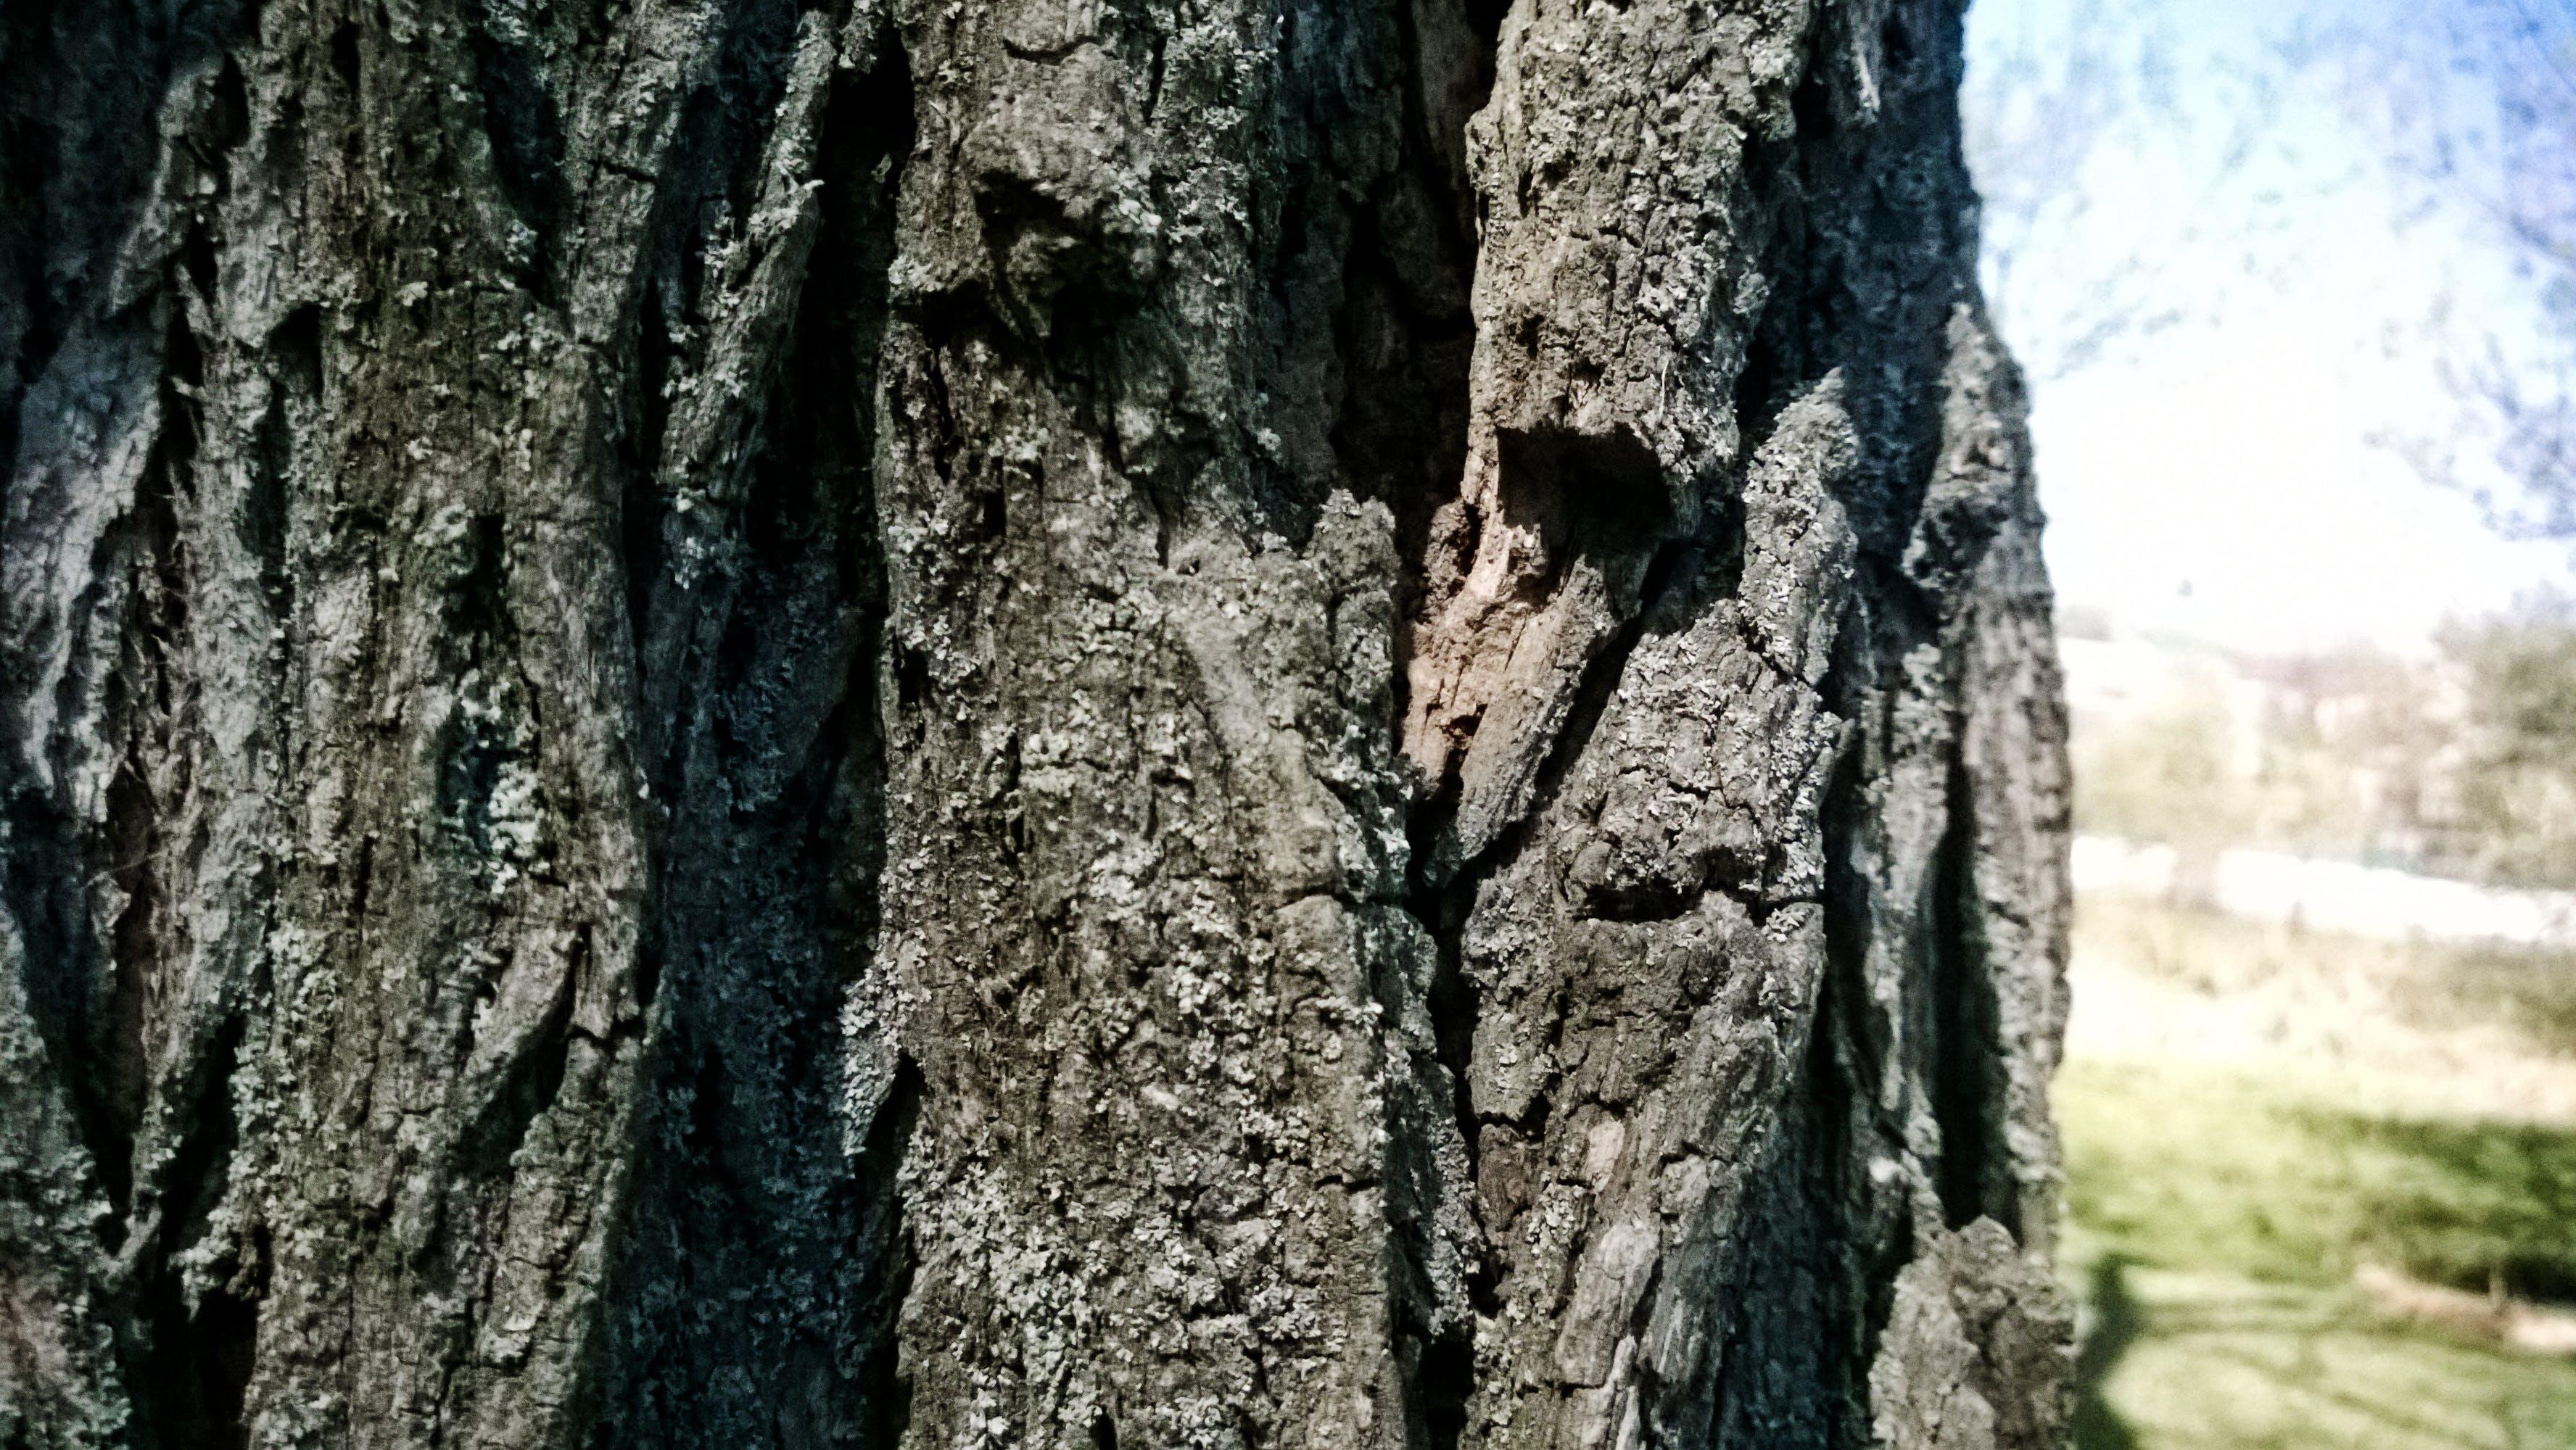 Free stock photo of barque, close-up, tree